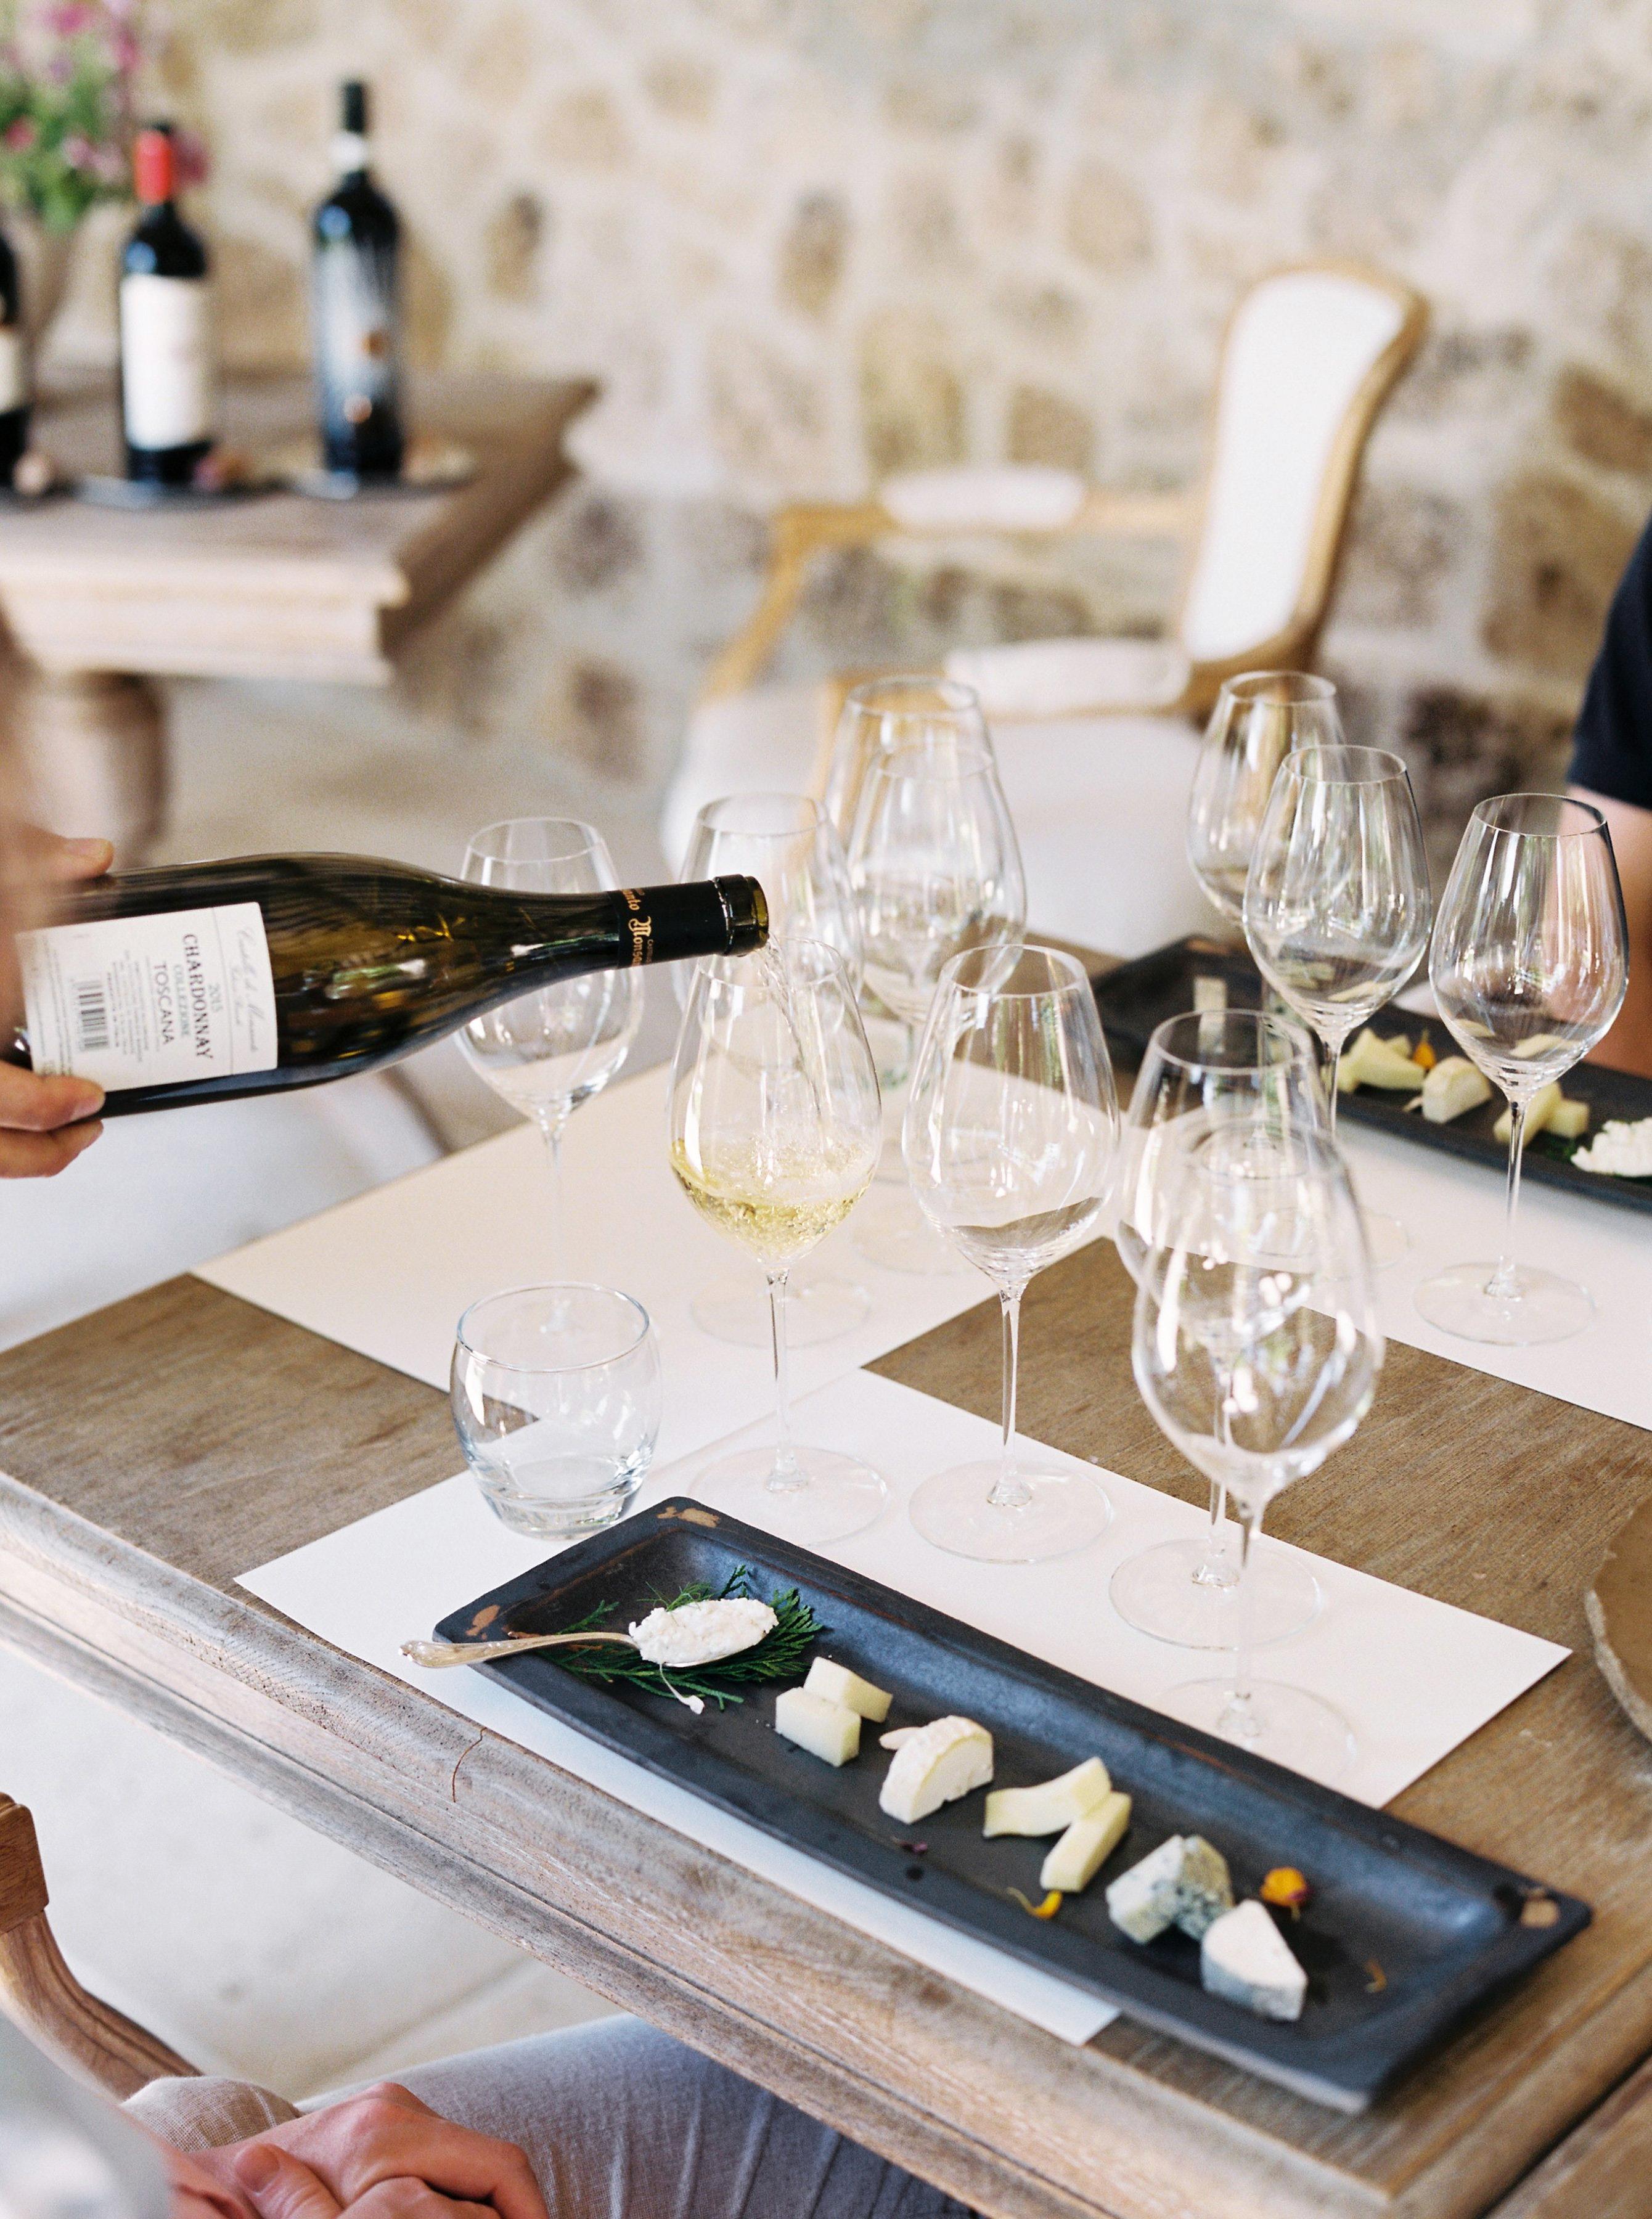 alexis zach wedding italy cheese tasting wine